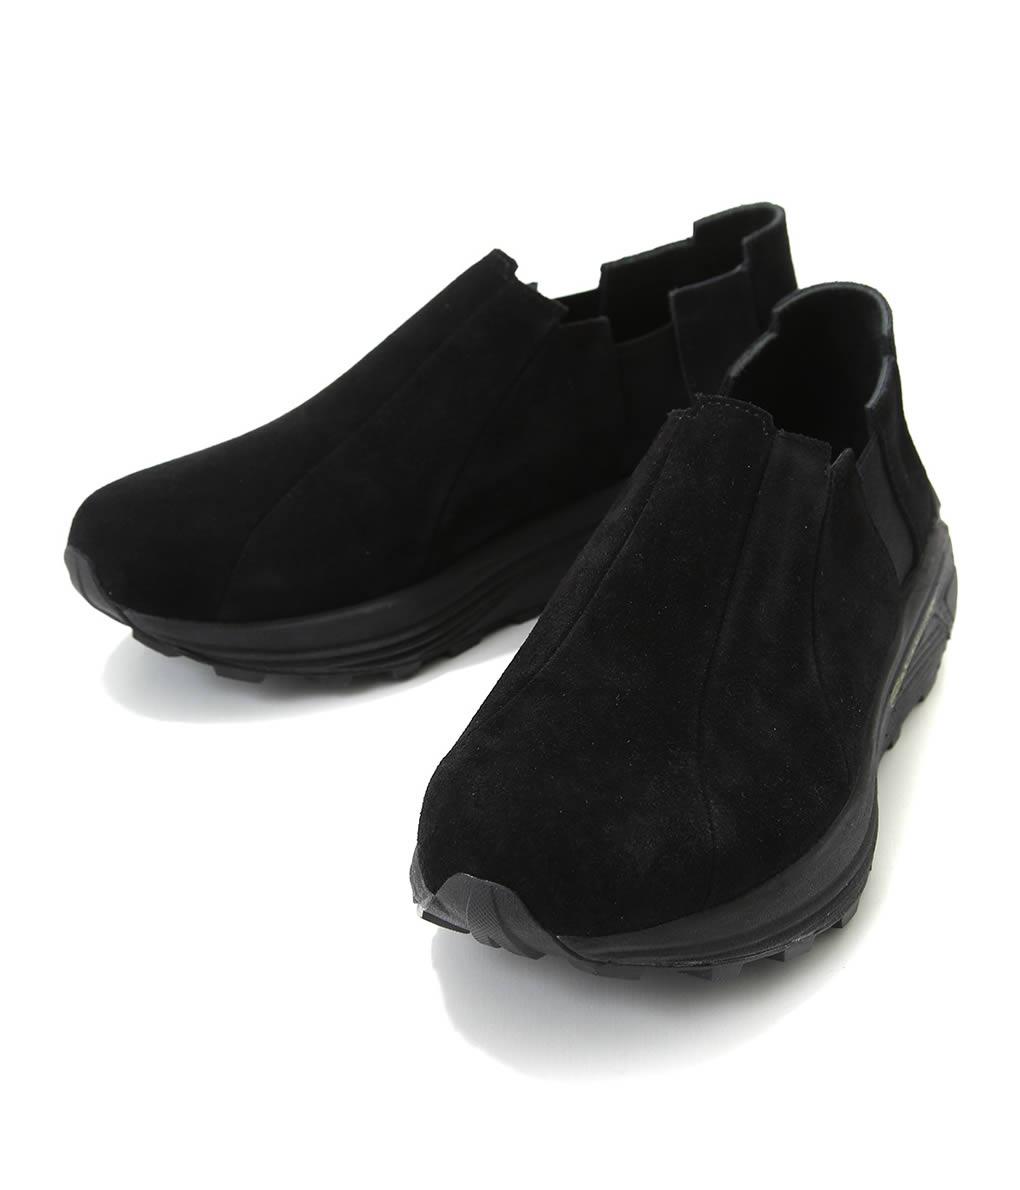 Hender Scheme / エンダースキーマ : peel gore / 全2色 : ピール ゴア レザーシューズ レザー 靴 シューズ メンズ : nc-s-plg 【BJB】【RIP】